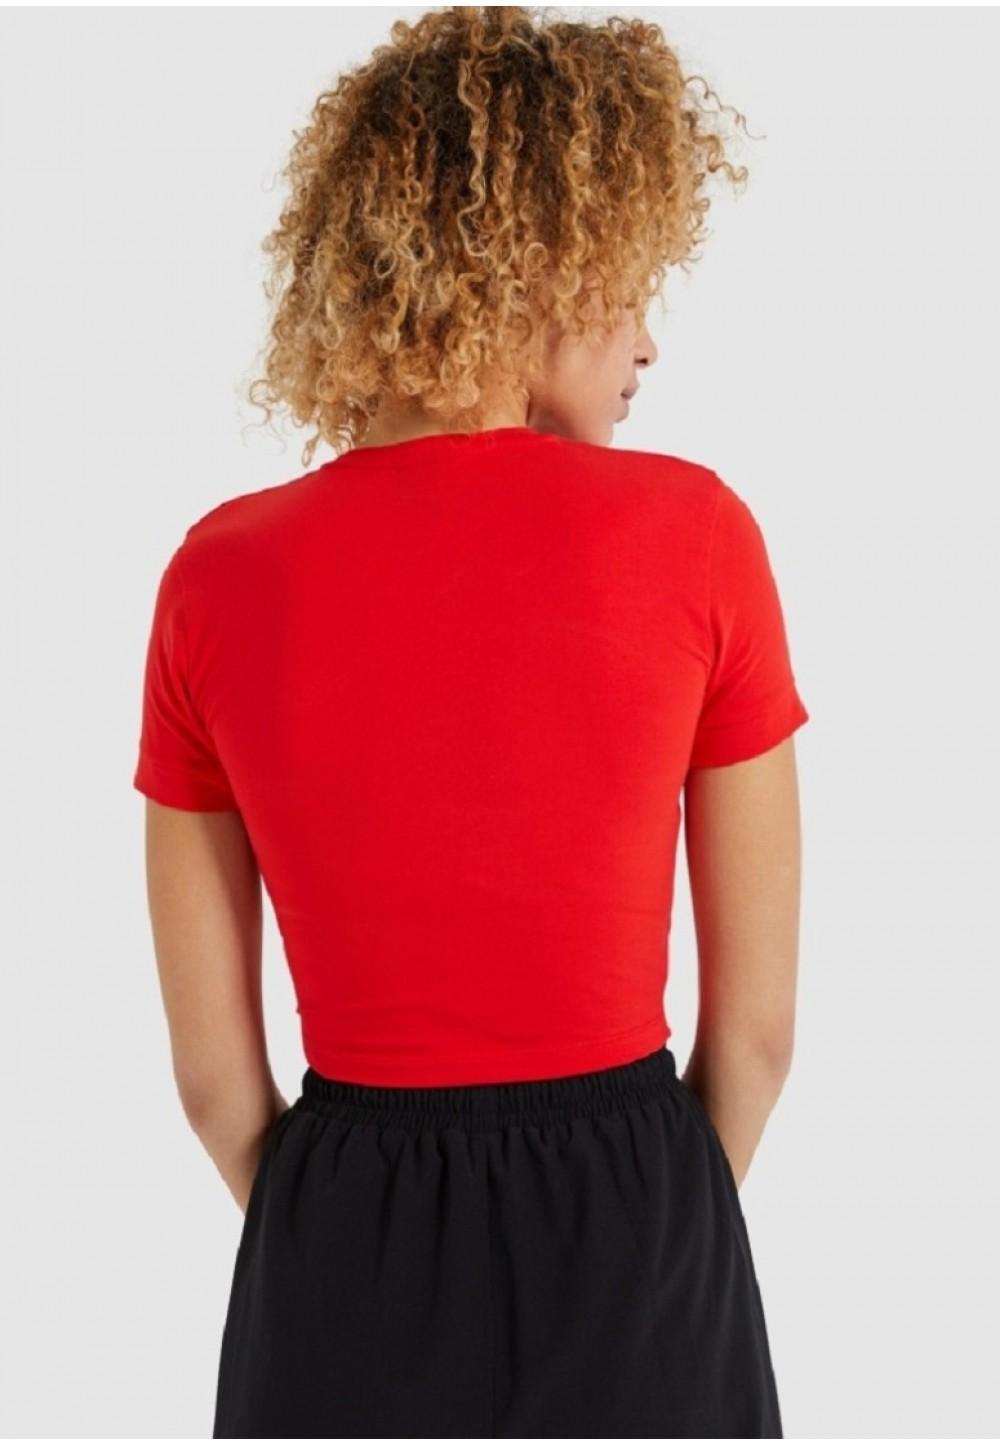 Красная футболка-топ